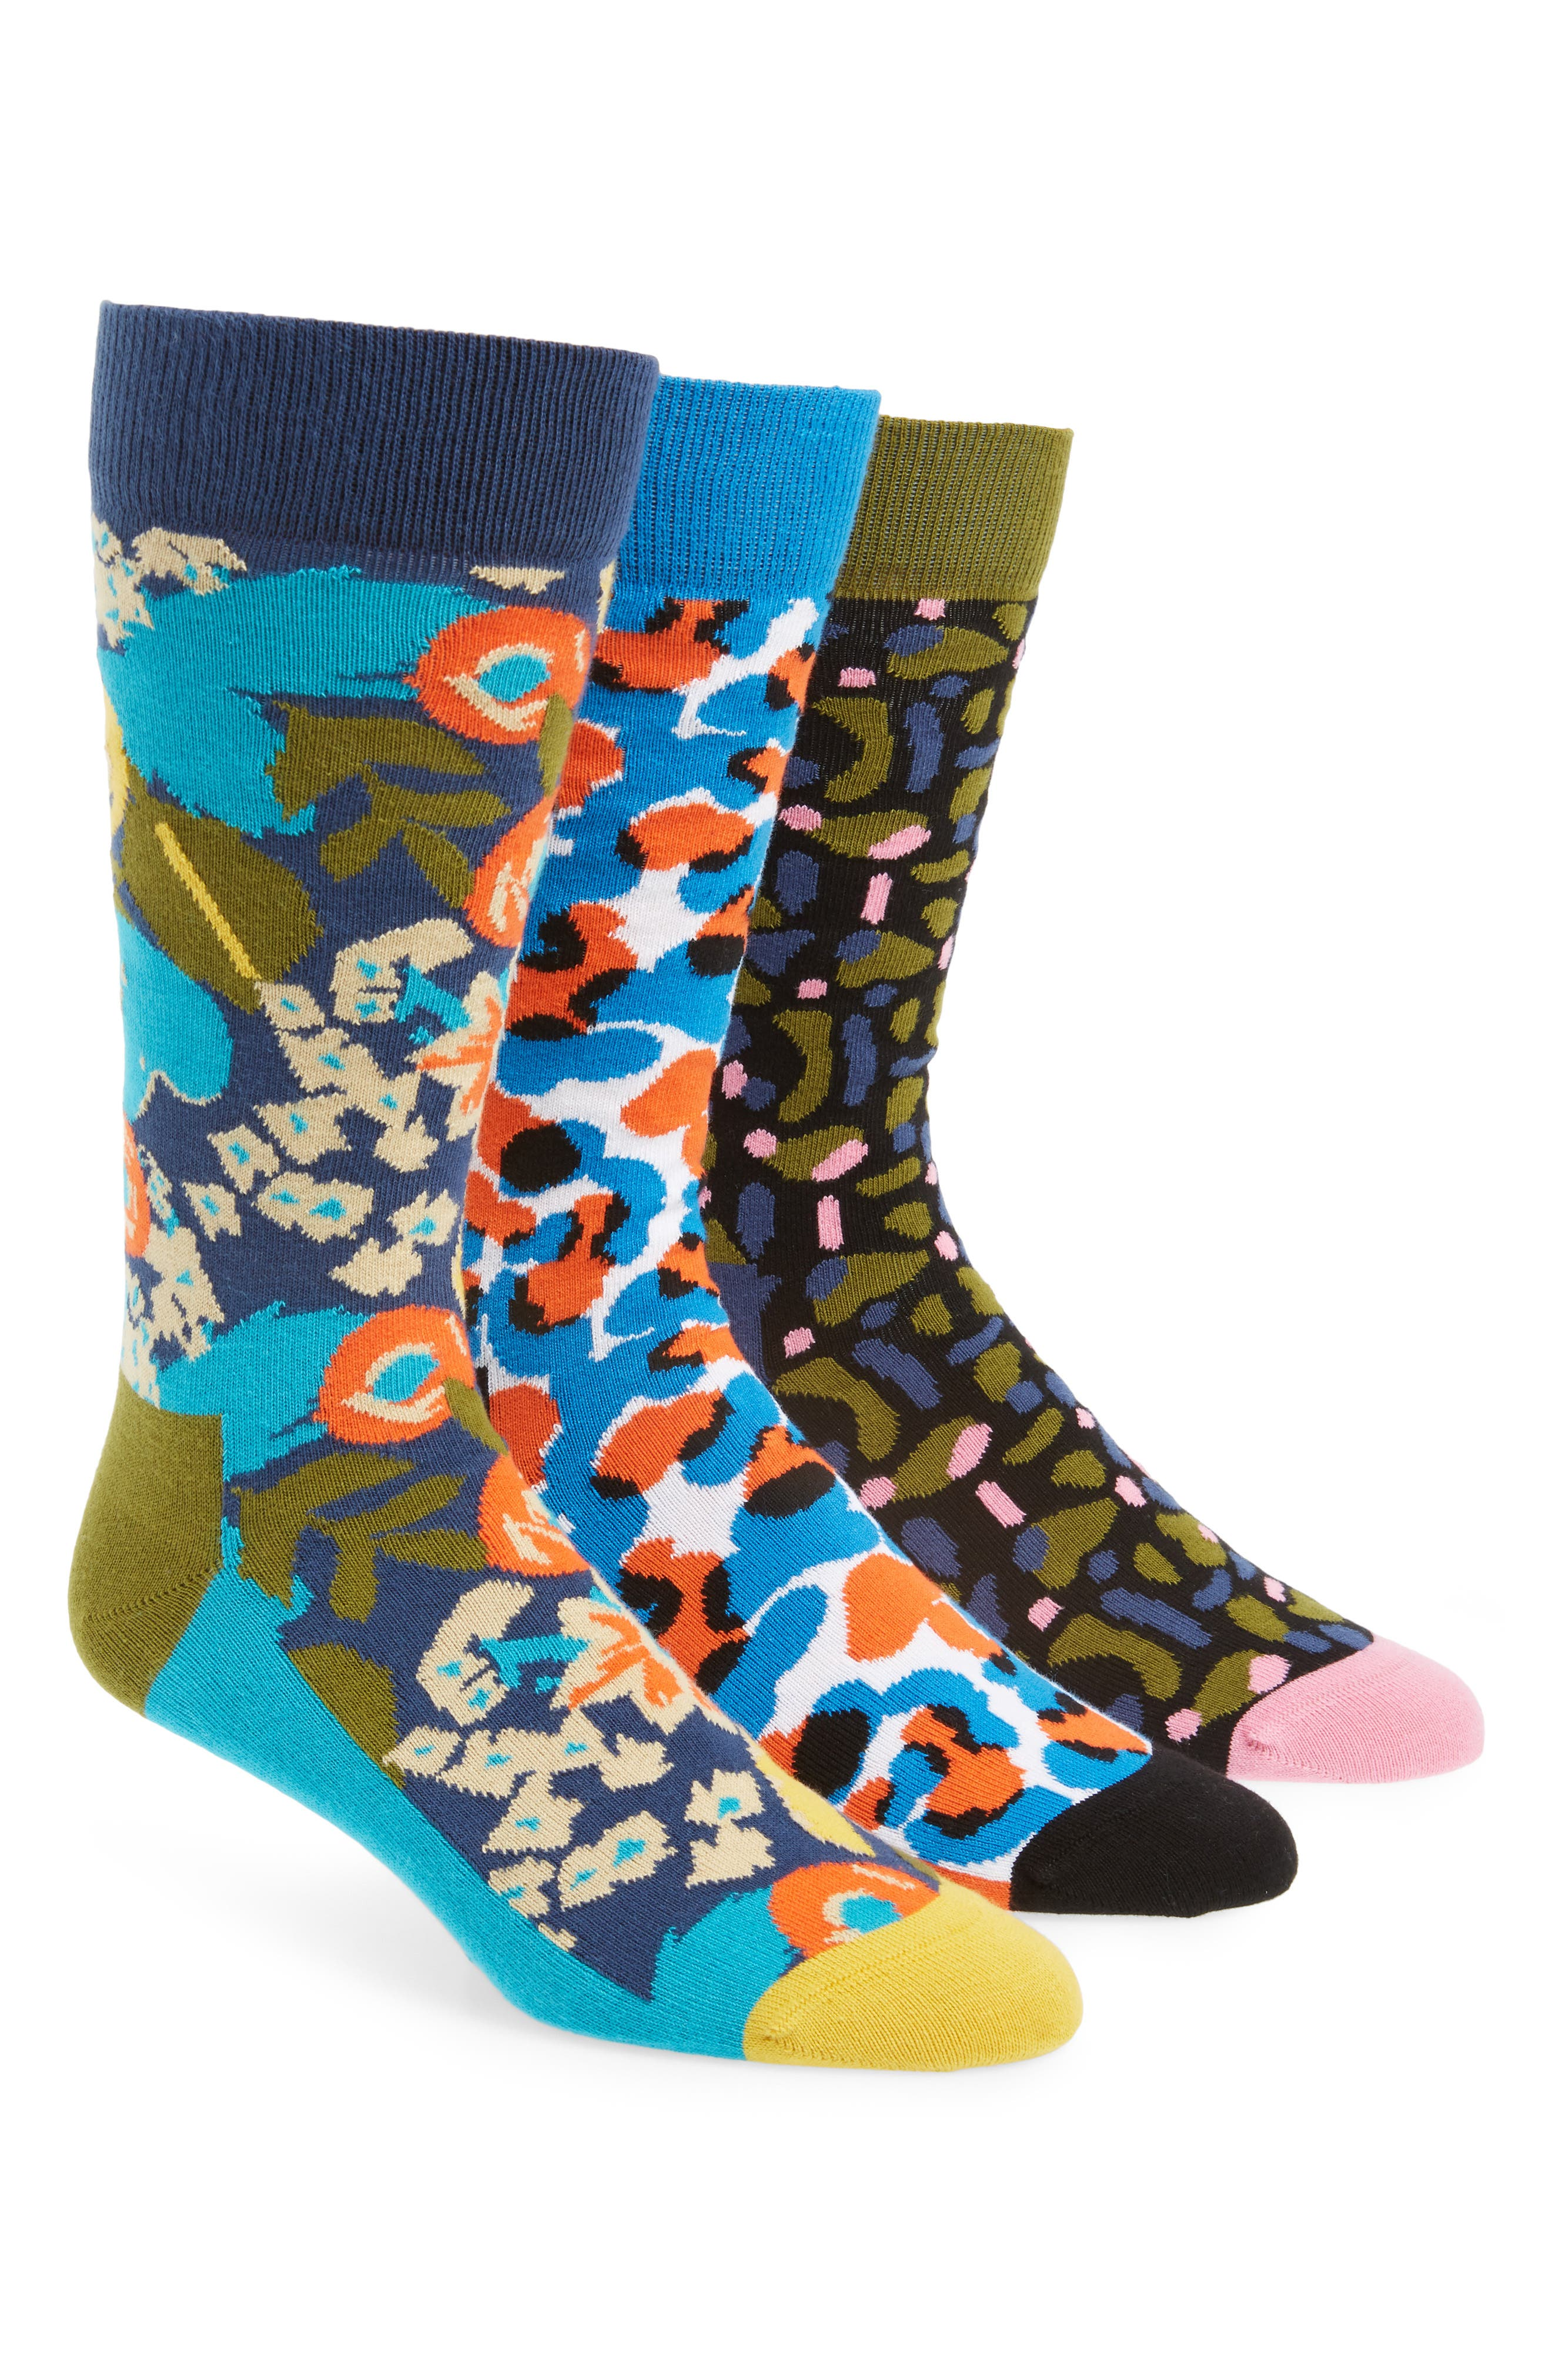 Wiz Khalifa 3-Pack Socks Boxed Set,                         Main,                         color, 462